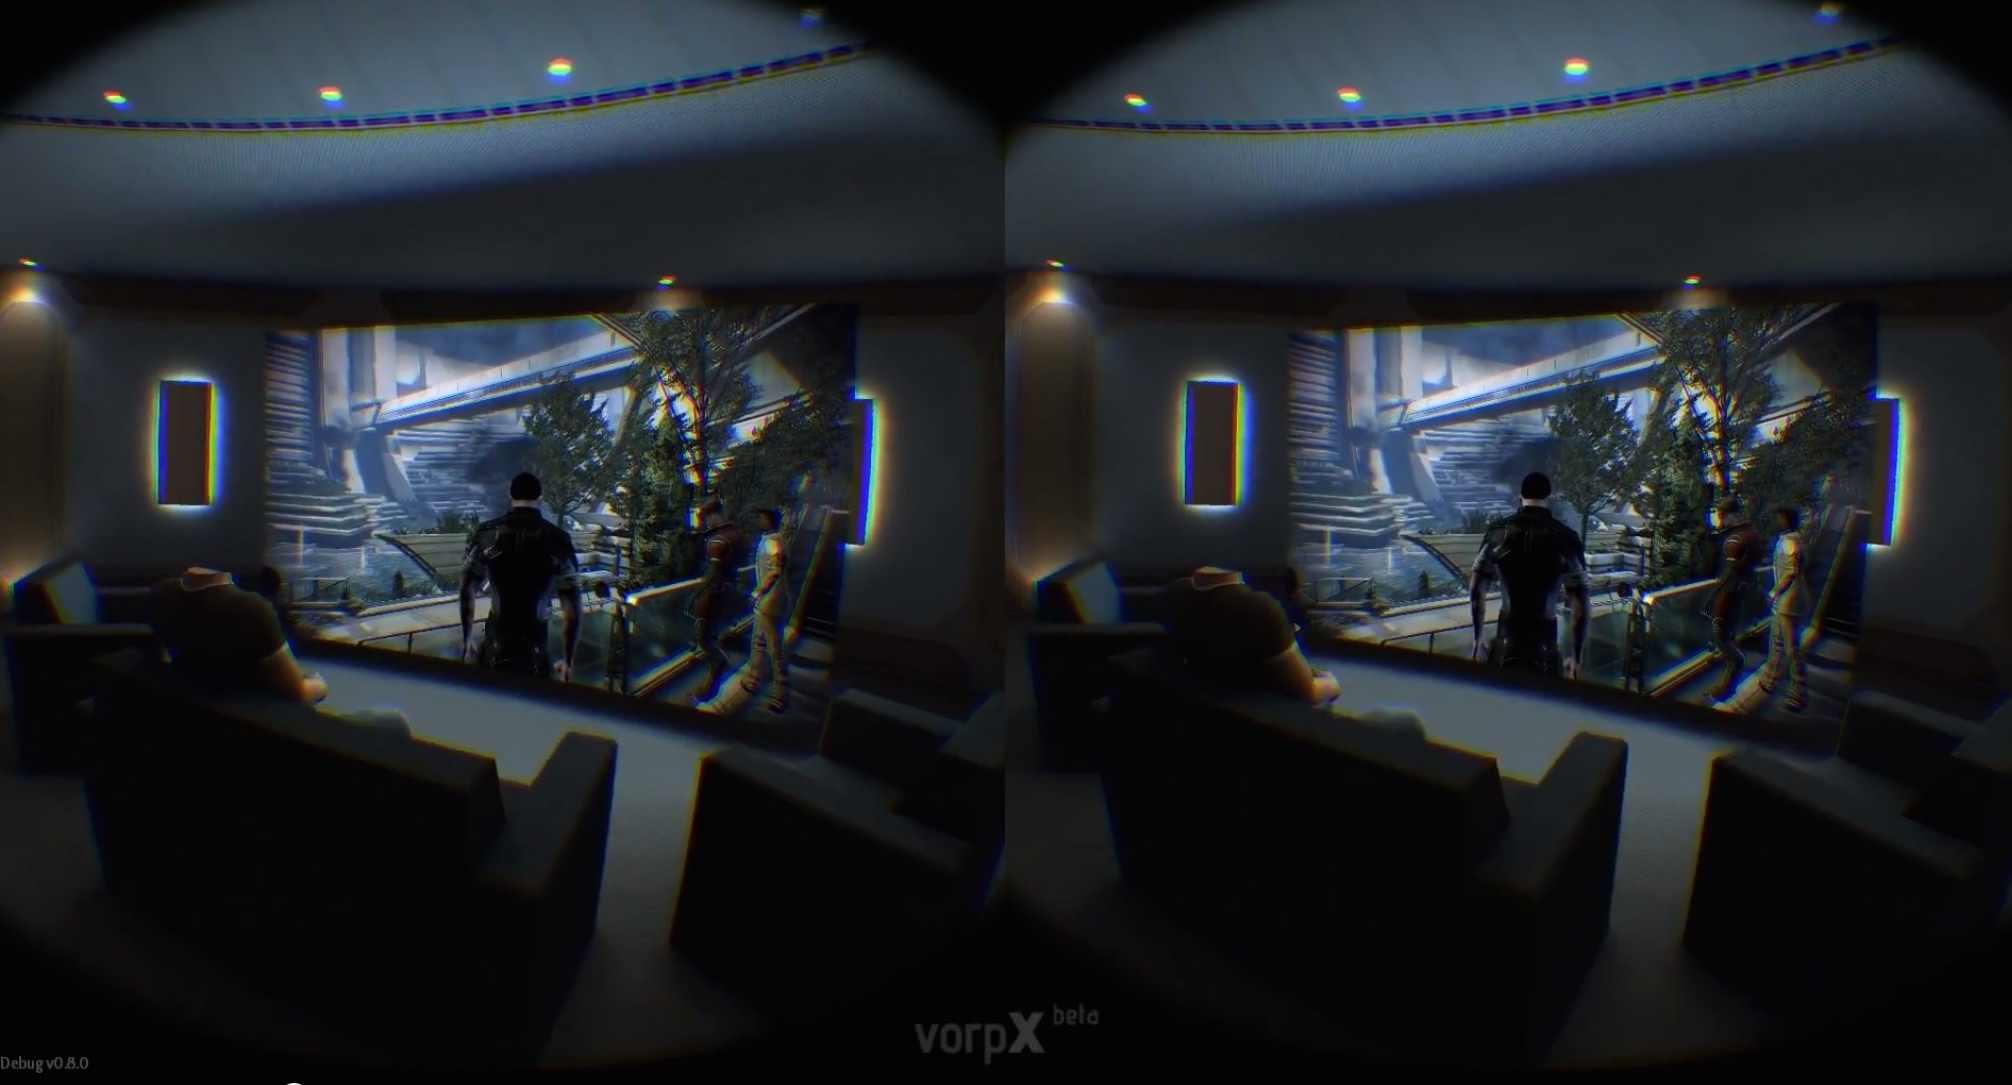 playstation vr cinematic mode